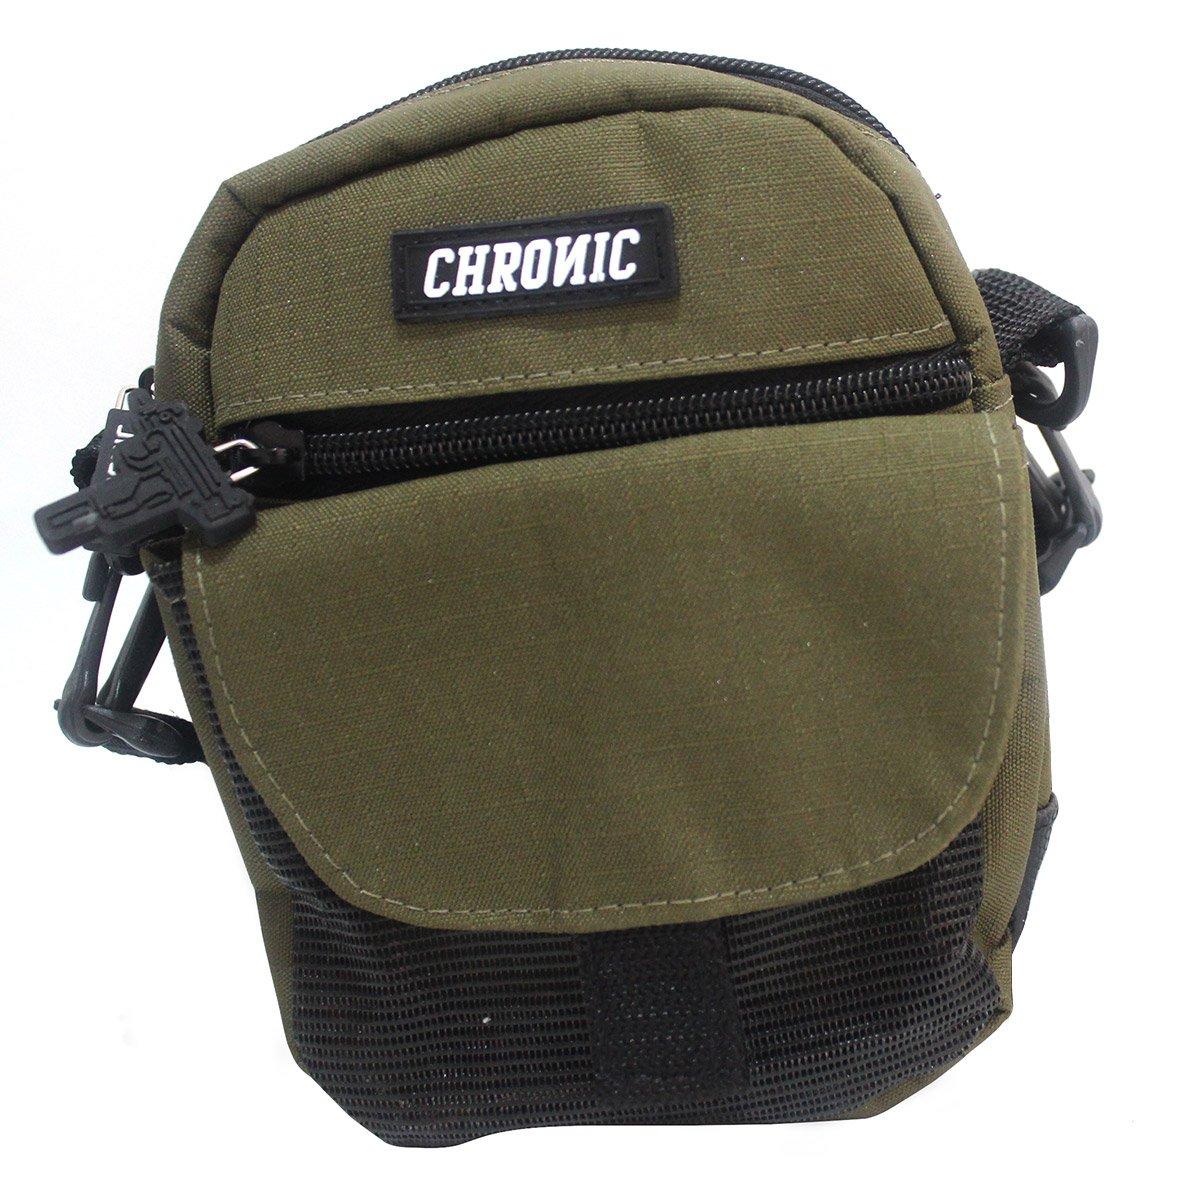 Shoulder Bag Chronic Verde Bolsa Ombro Pochete Original